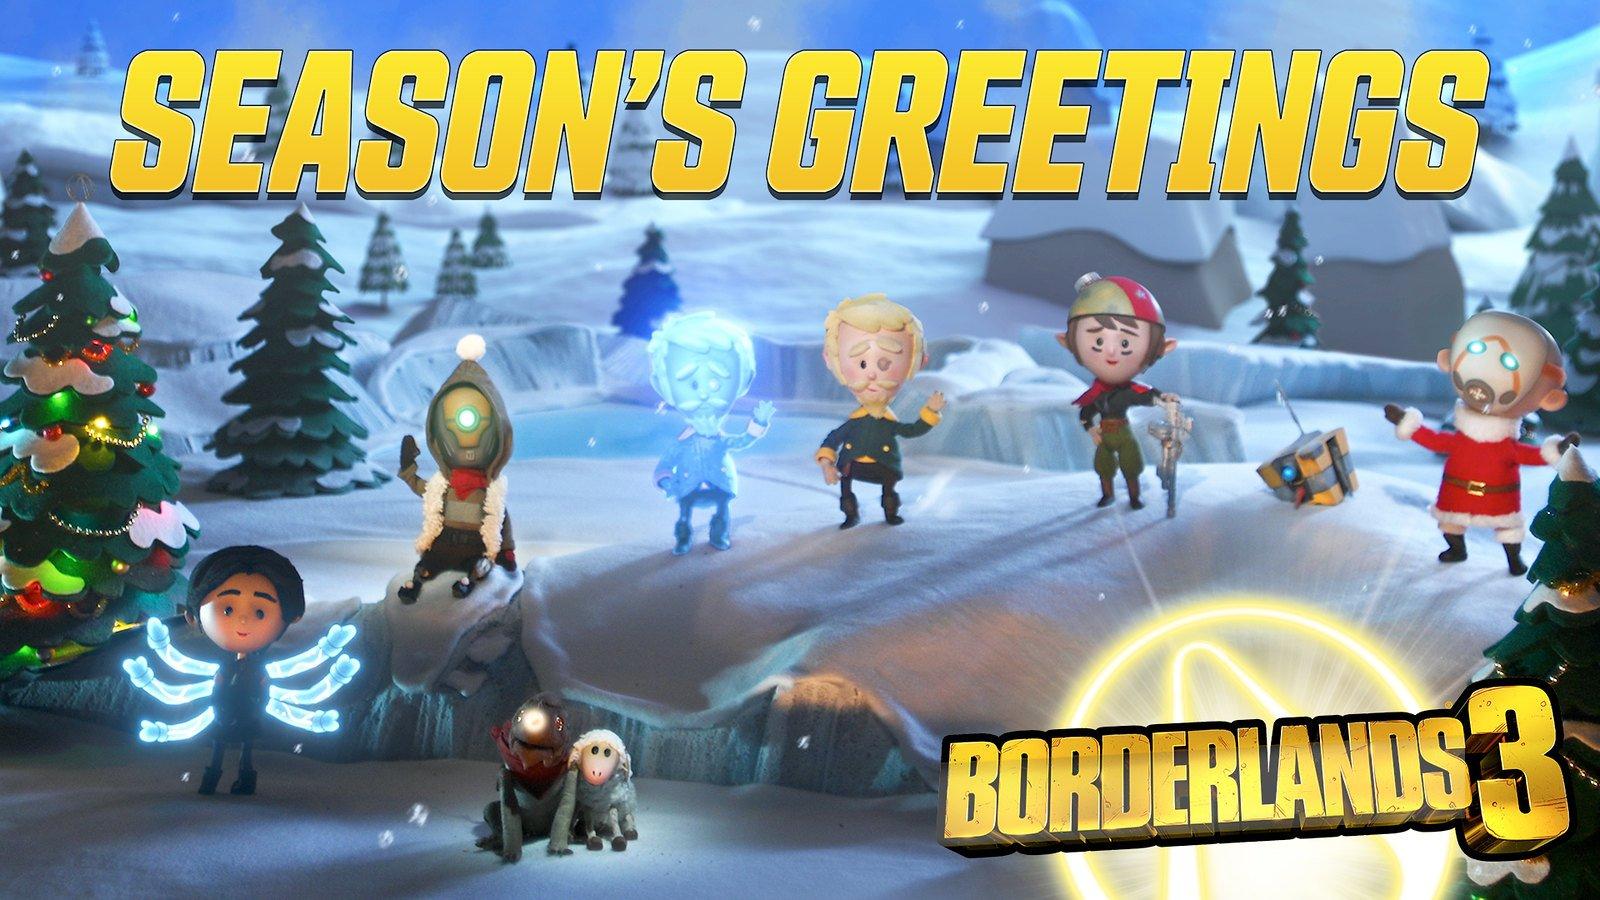 Borderlands 3 Happy Holidays Wallpaper